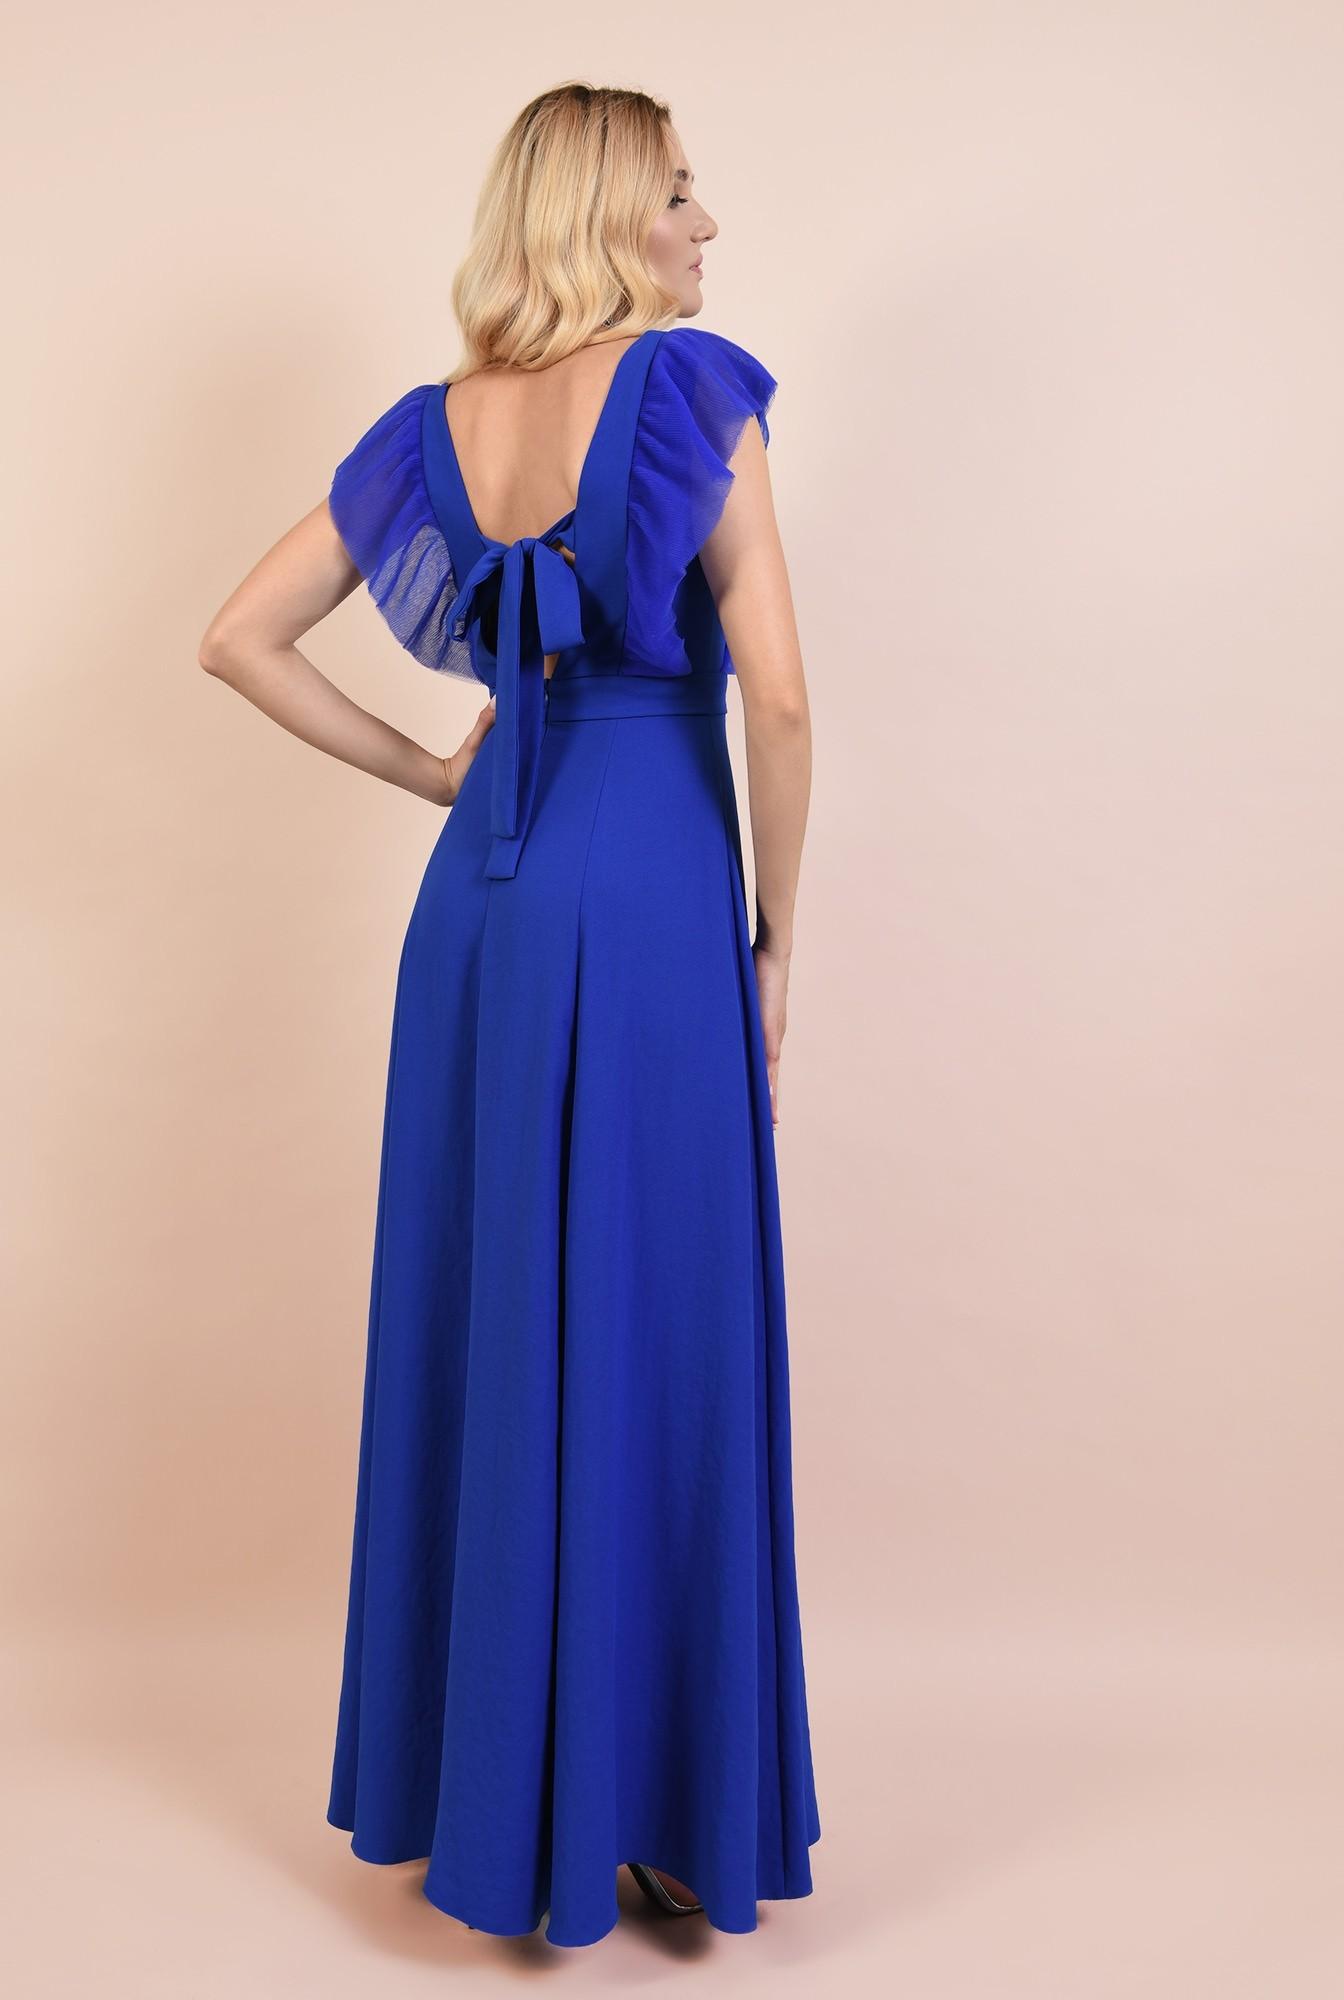 1 - rochie eleganta, lunga, cu anchior, slit, funda la spate